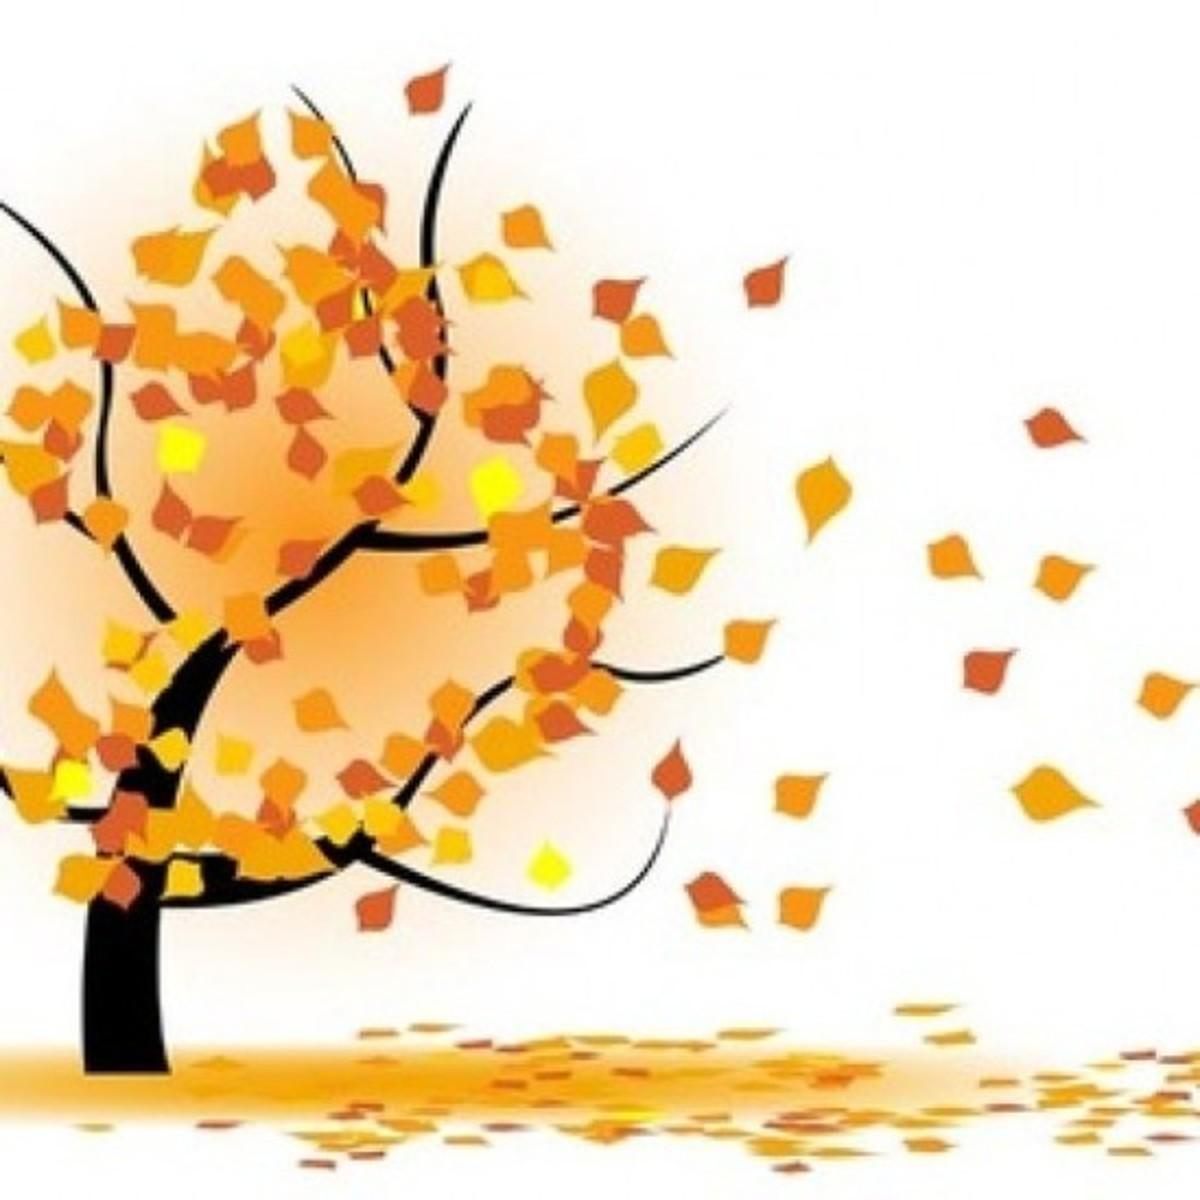 Tree Losing Leaves in Autumn Wind